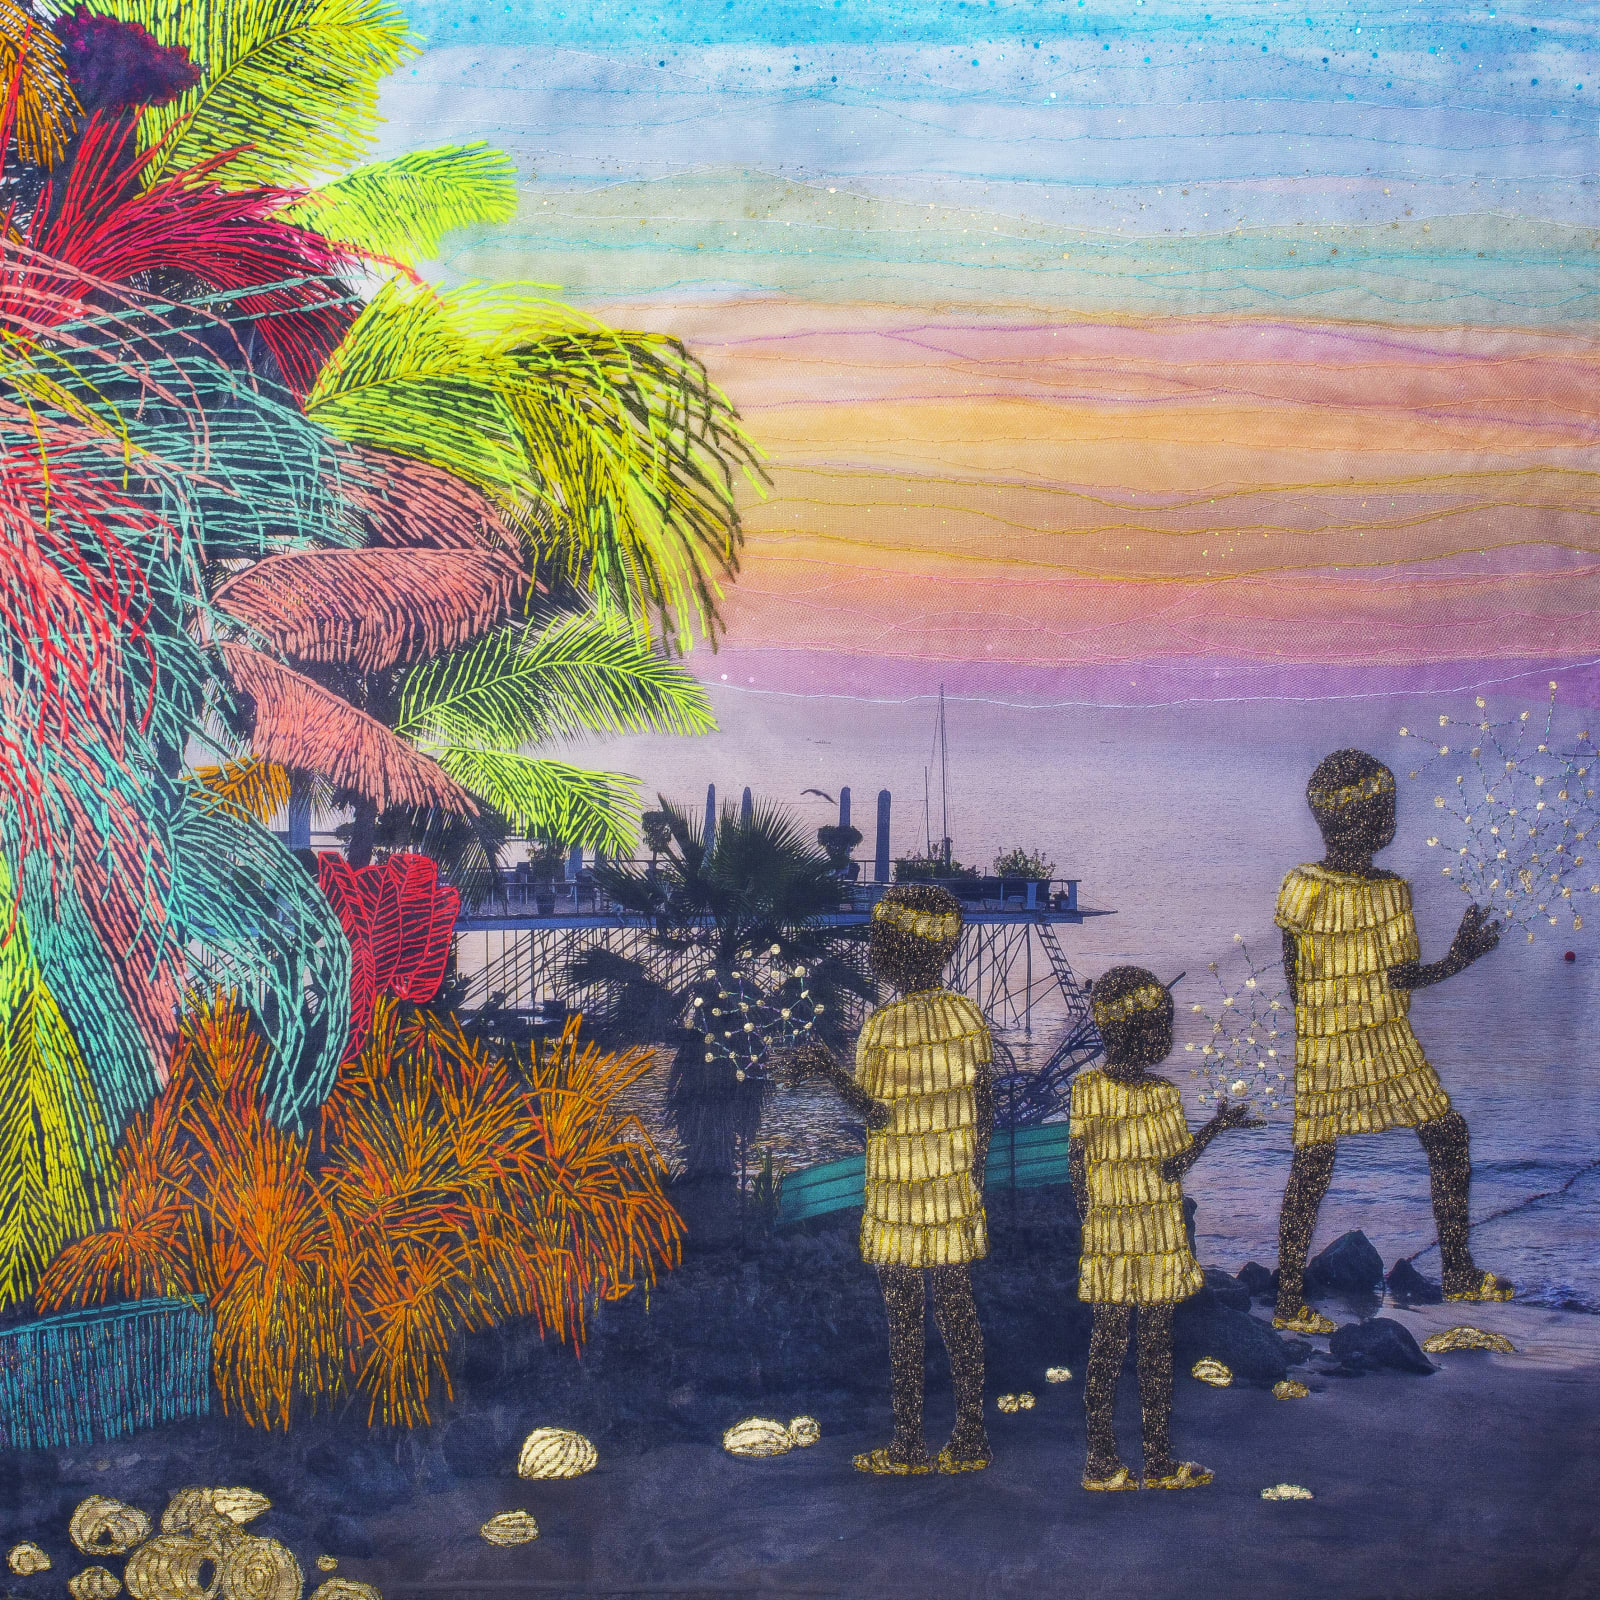 Joana Choumali The Healers, 2020 Mixed Media Embroidery on digital photography printed on canvas 80 x 80 cm (LOFT0628)